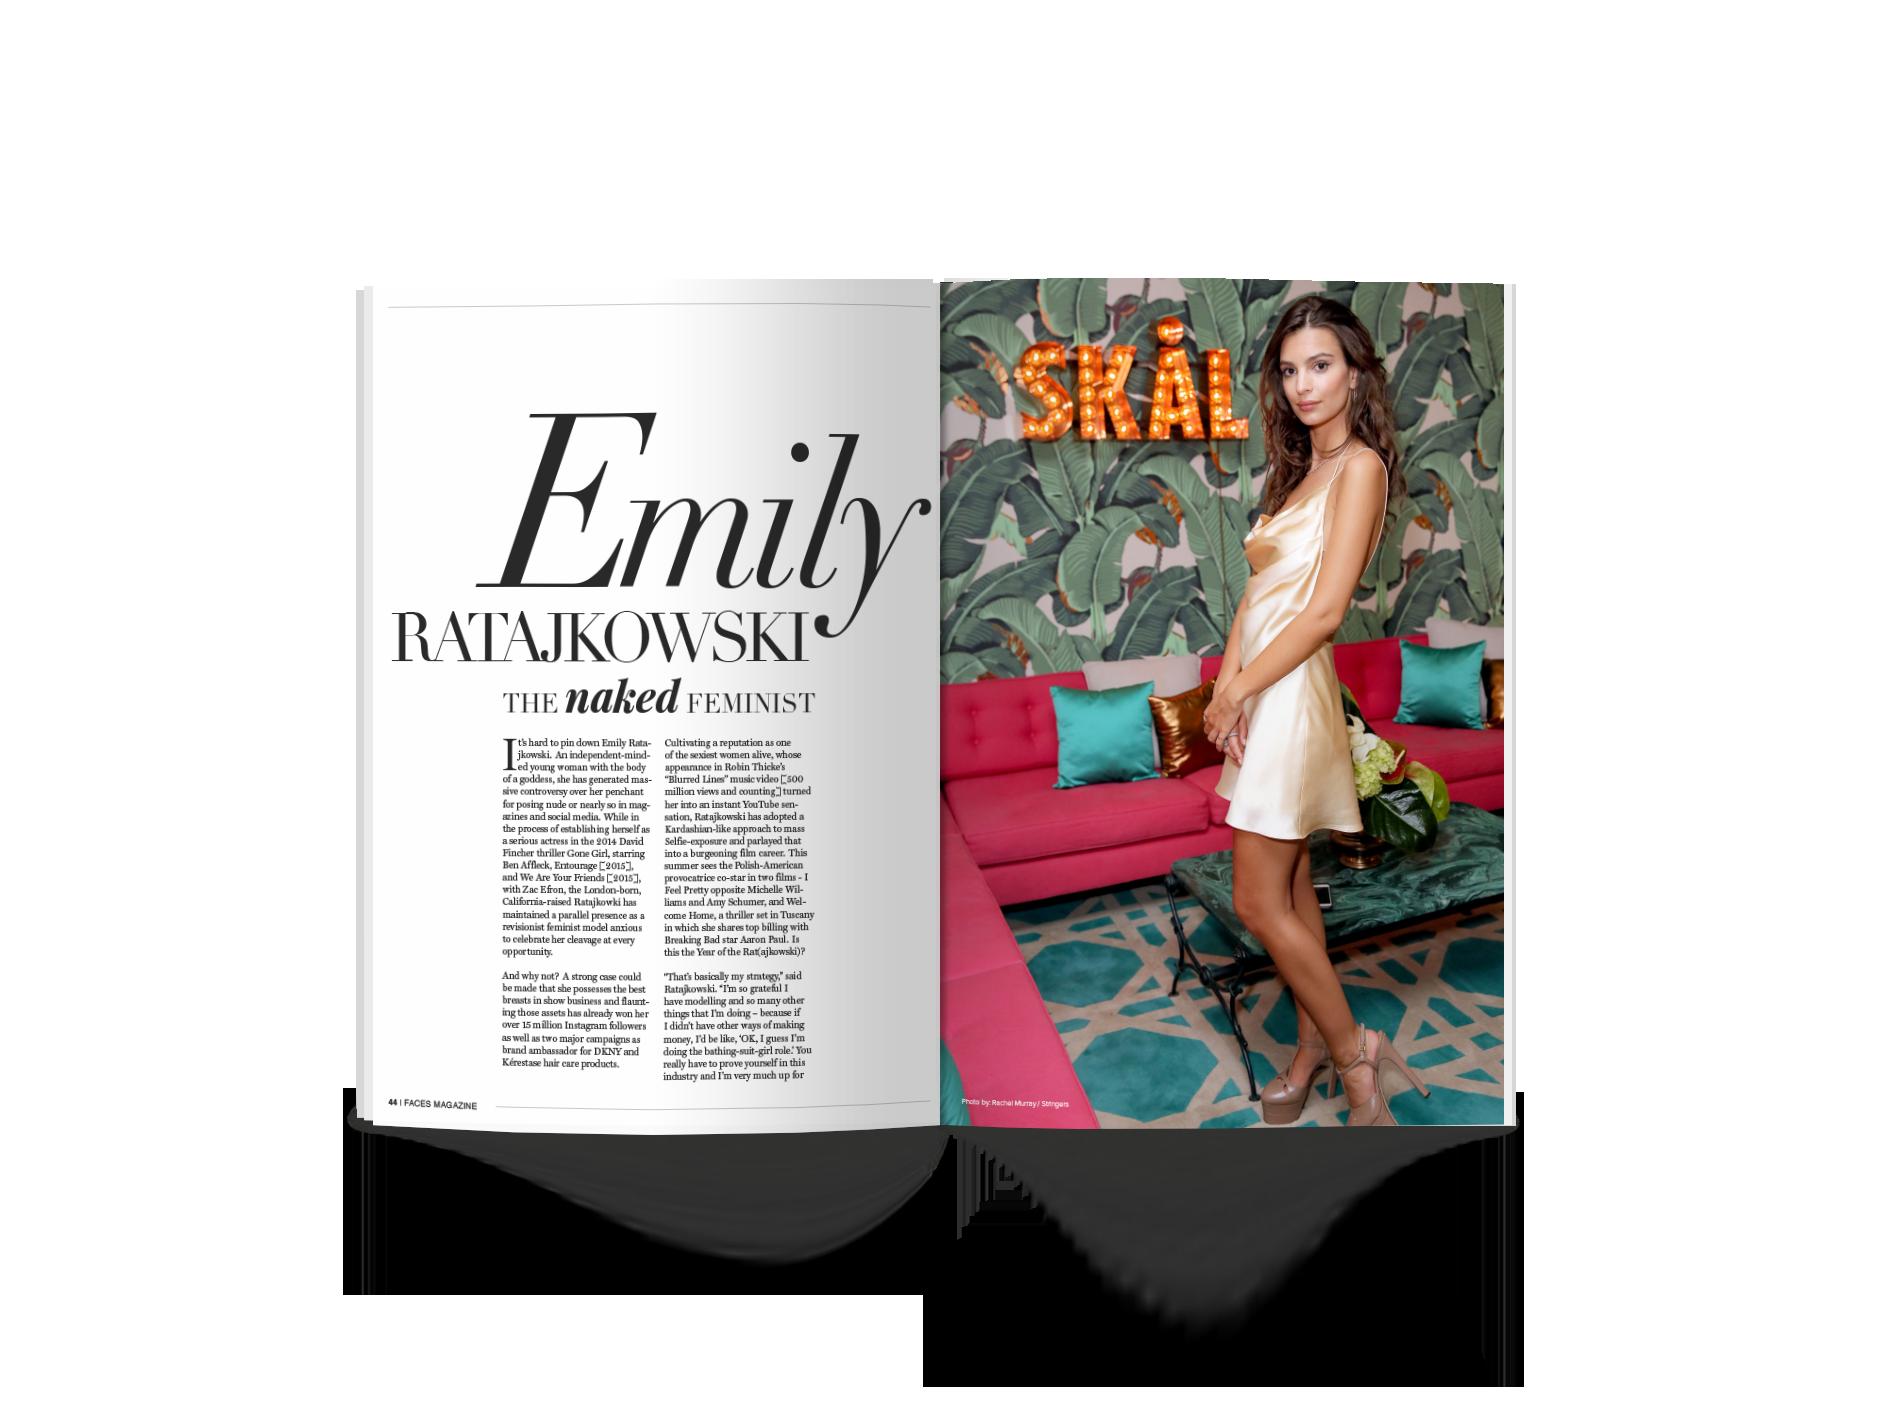 FACES Magazine - Emily R Interview Spread Design